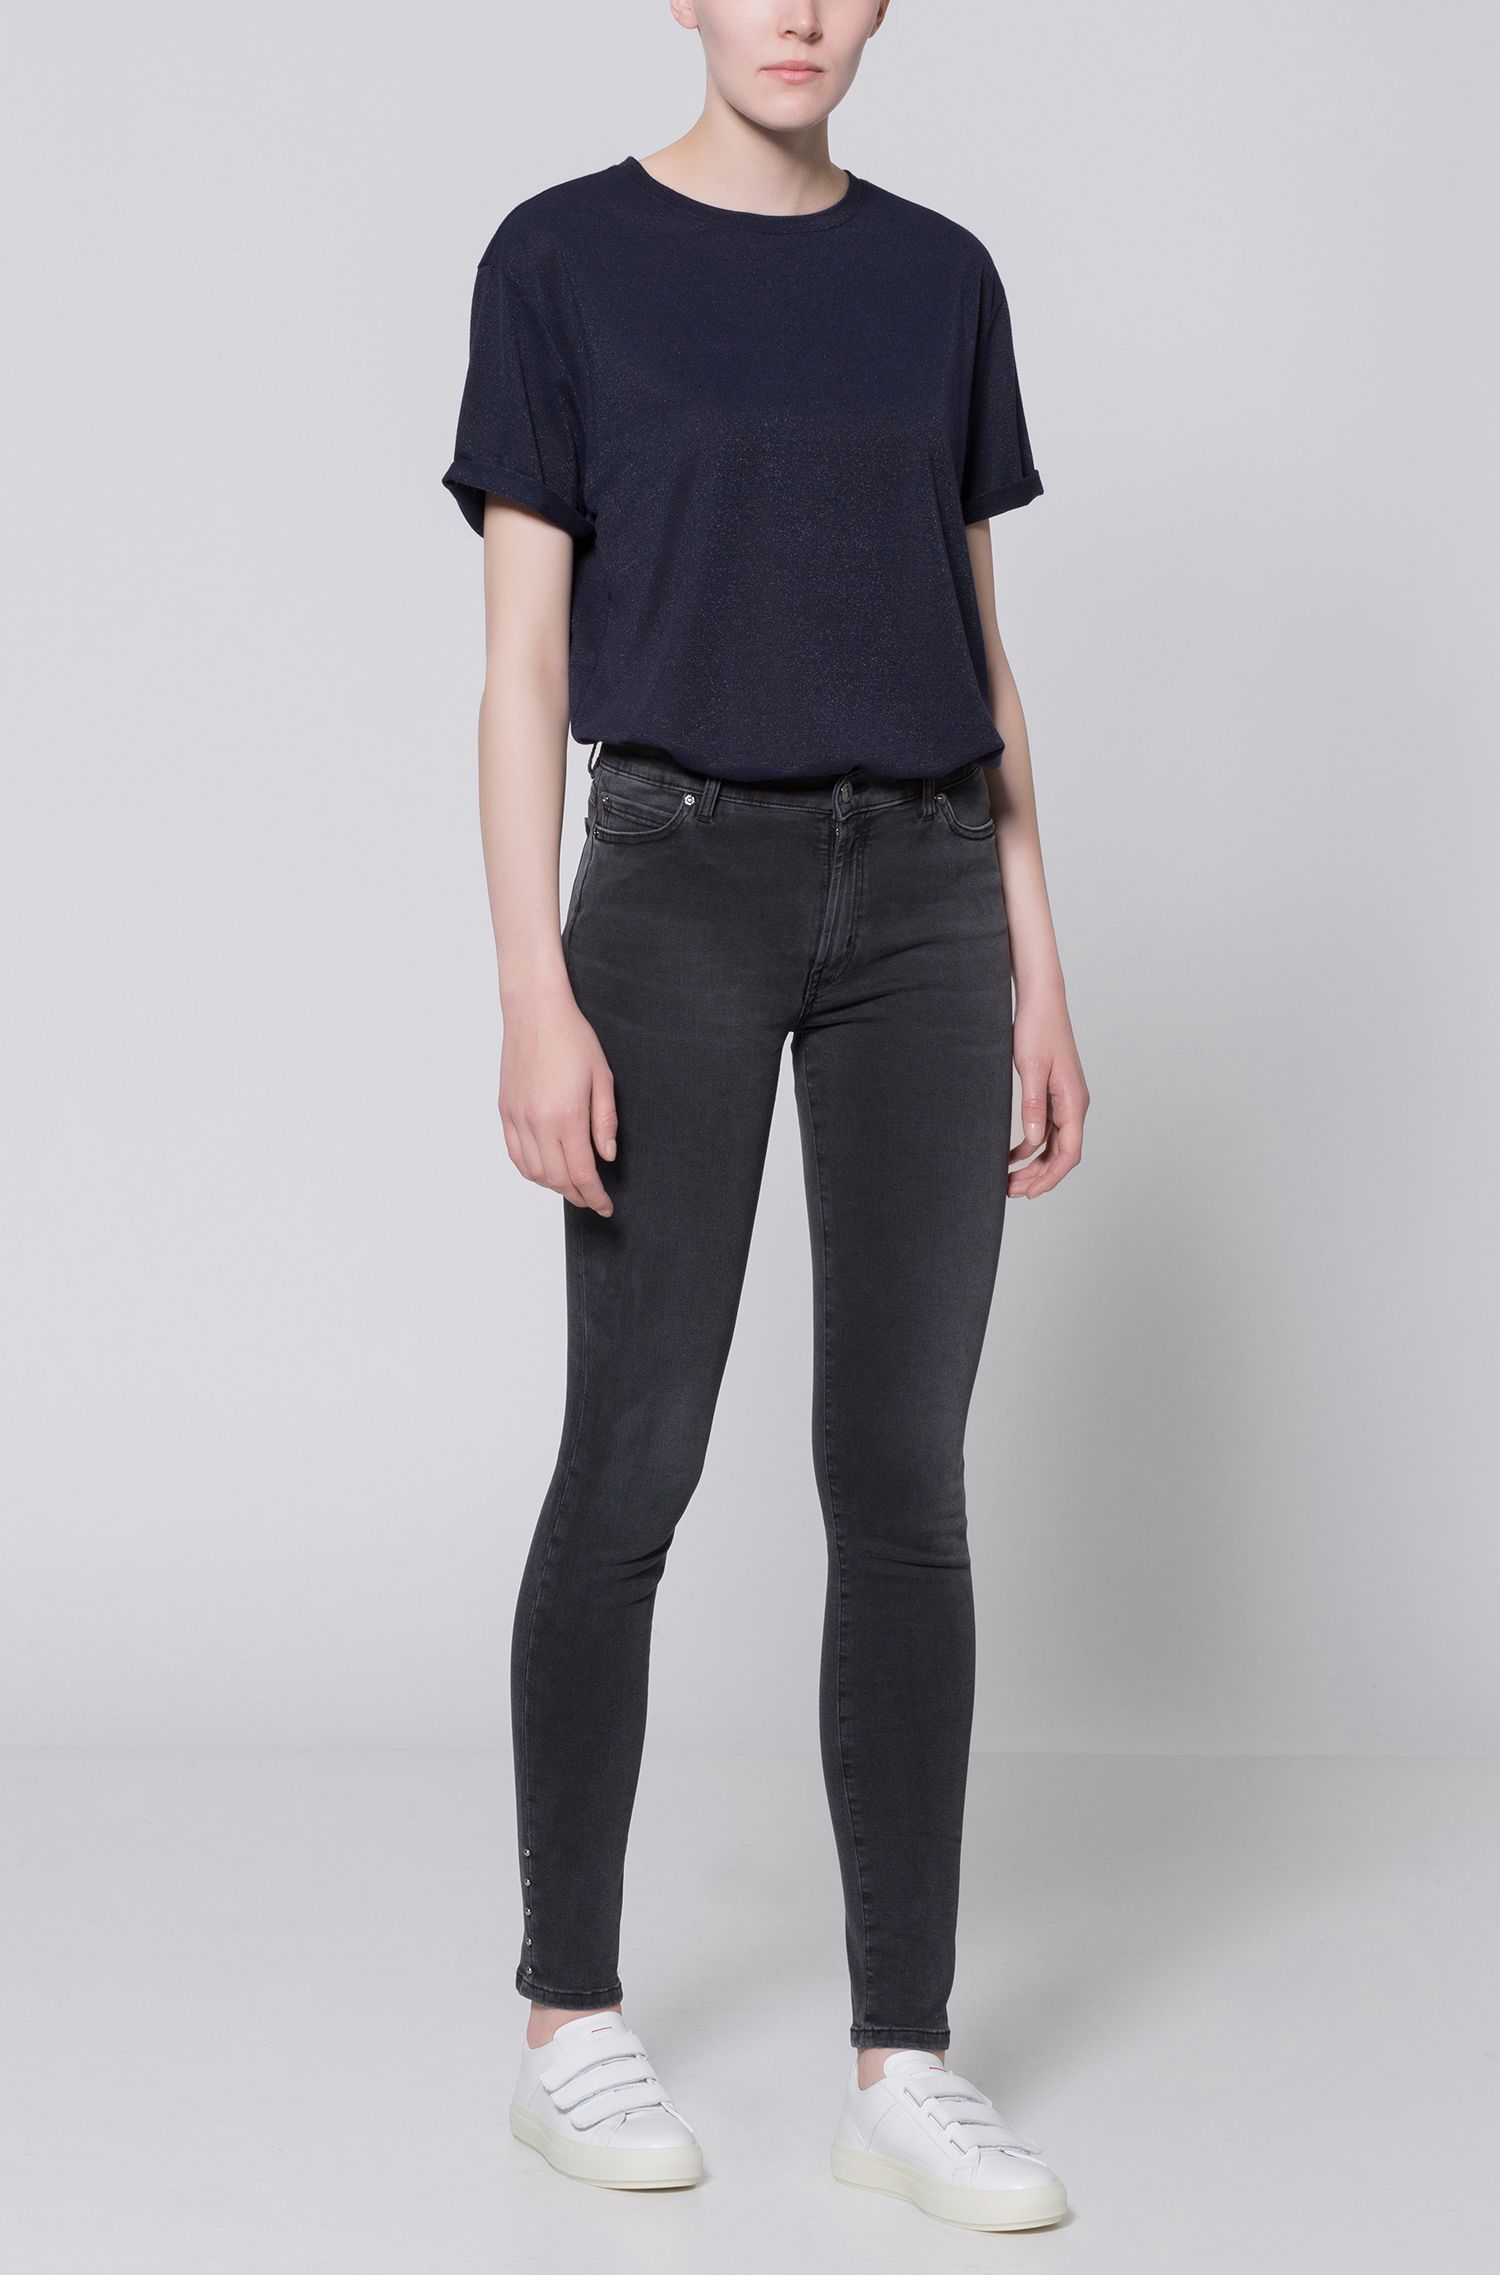 Oversized T-Shirt | Denale